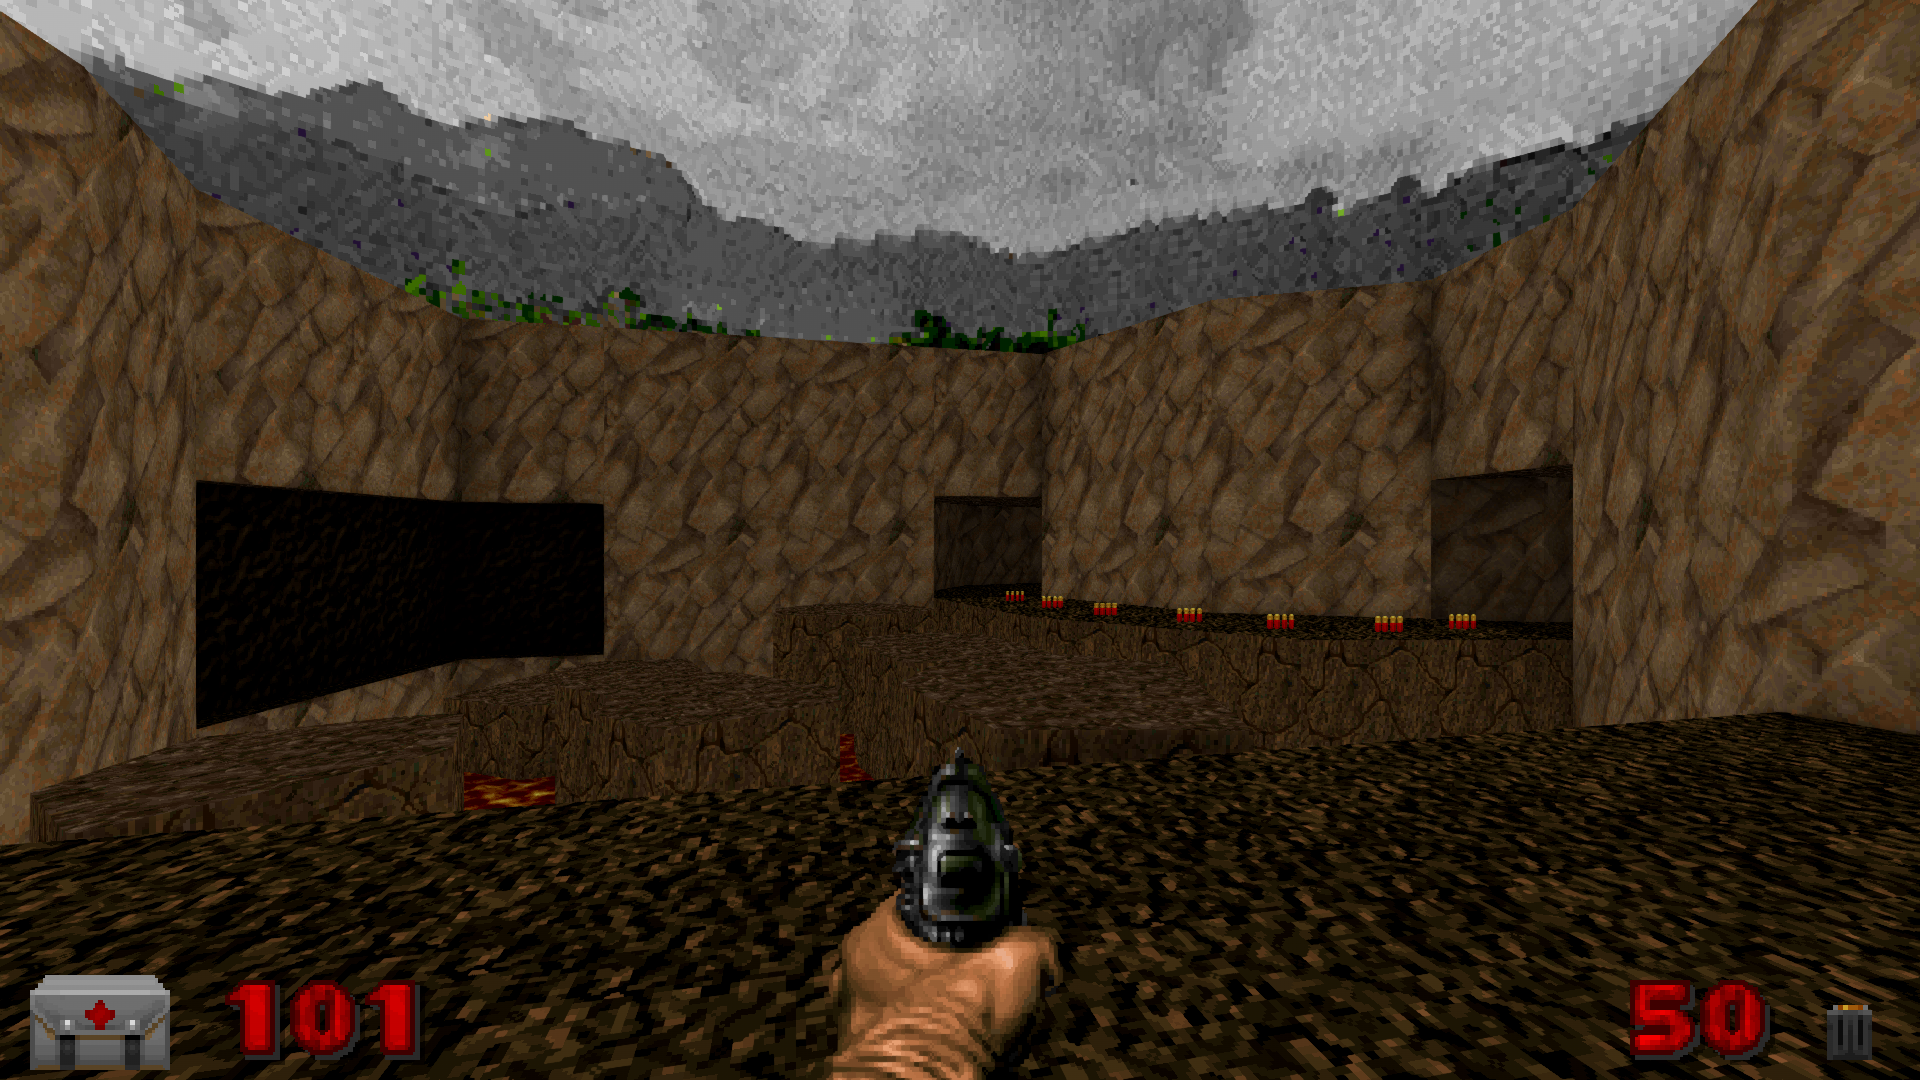 Screenshot_Doom_20210225_184646.png.eda12a5b7b8a96ce870da0e1fb22013f.png